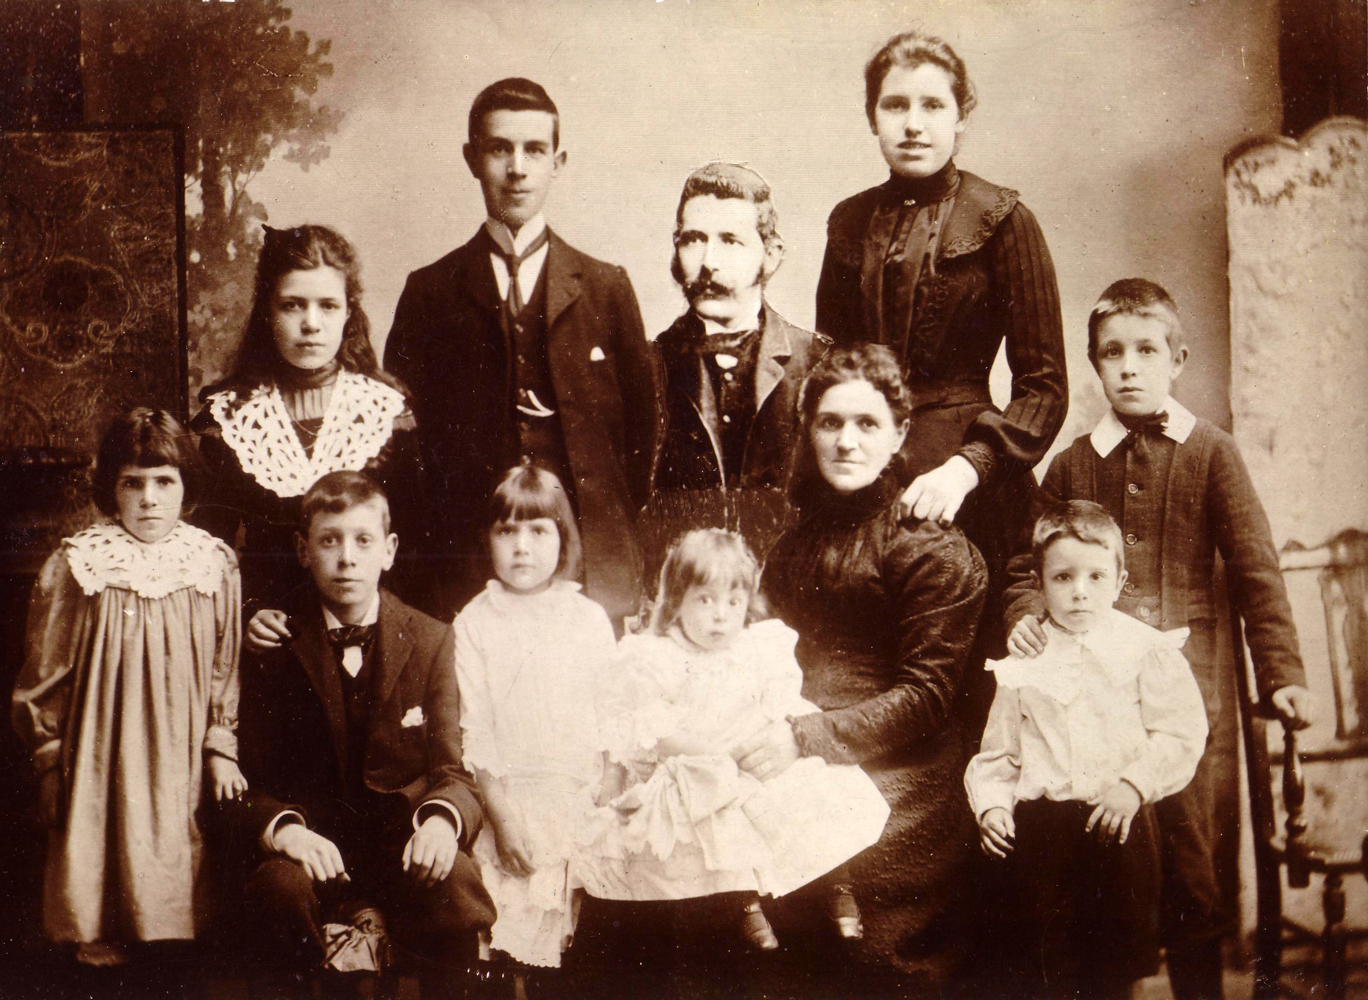 Studio Portrait Victorian Family Montage 1890s